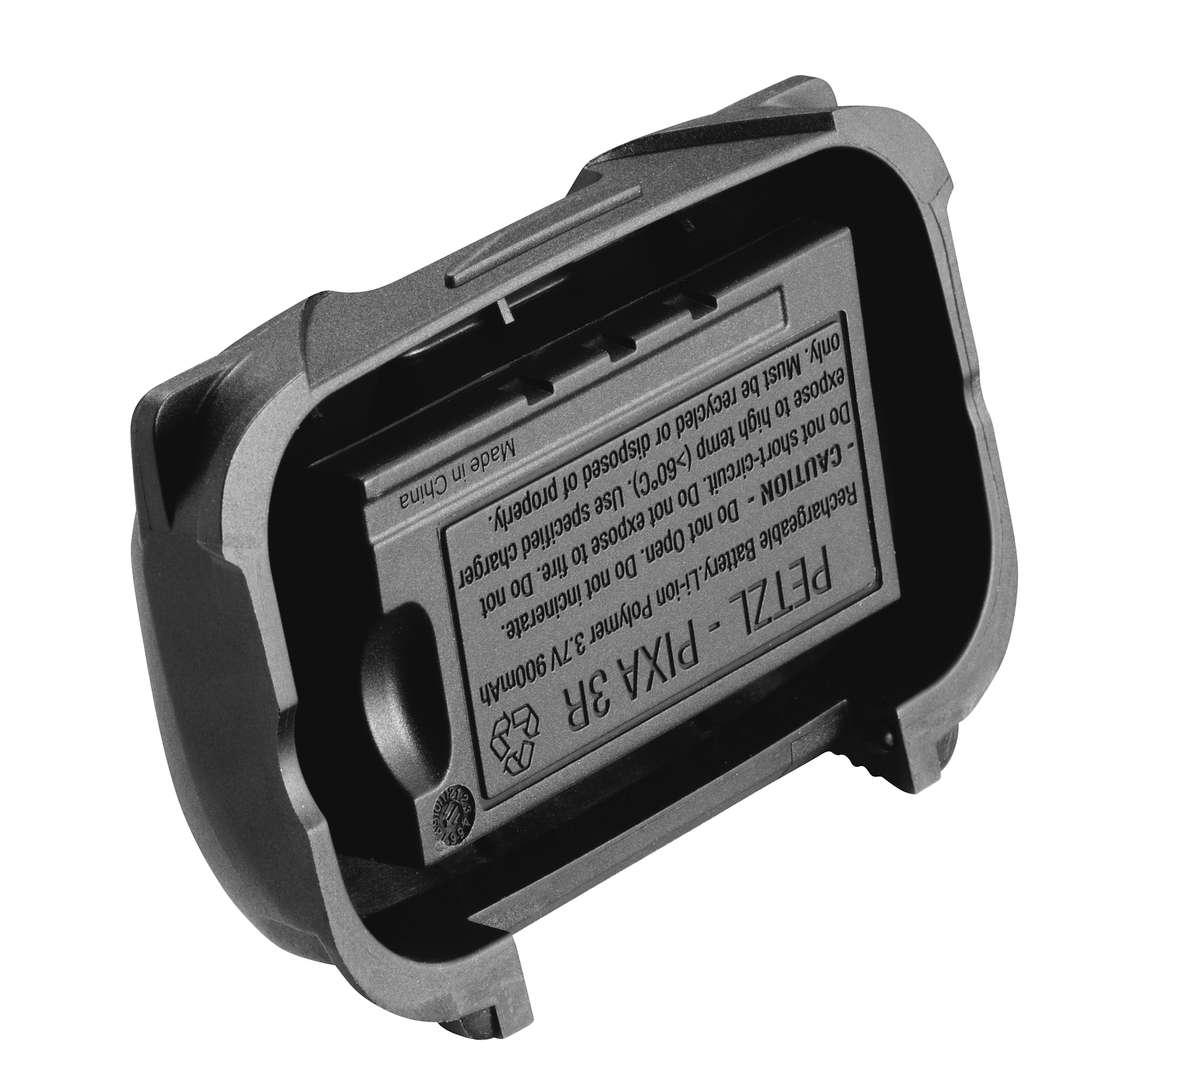 Batteria ricaricabile per PIXA® 3R